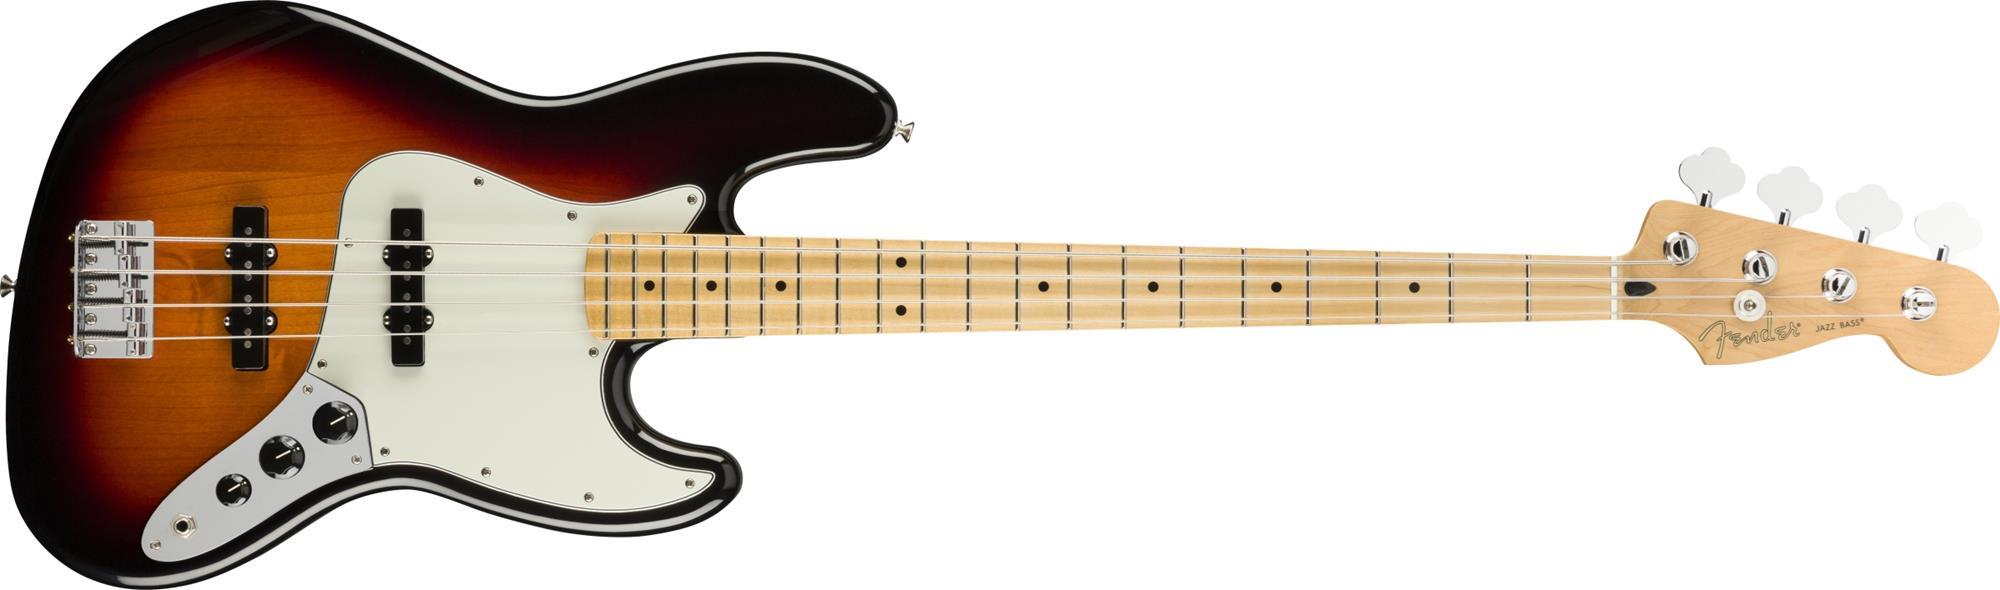 FENDER-Player-Jazz-Bass-MN-3-Color-Sunburst-0149902500-sku-24578